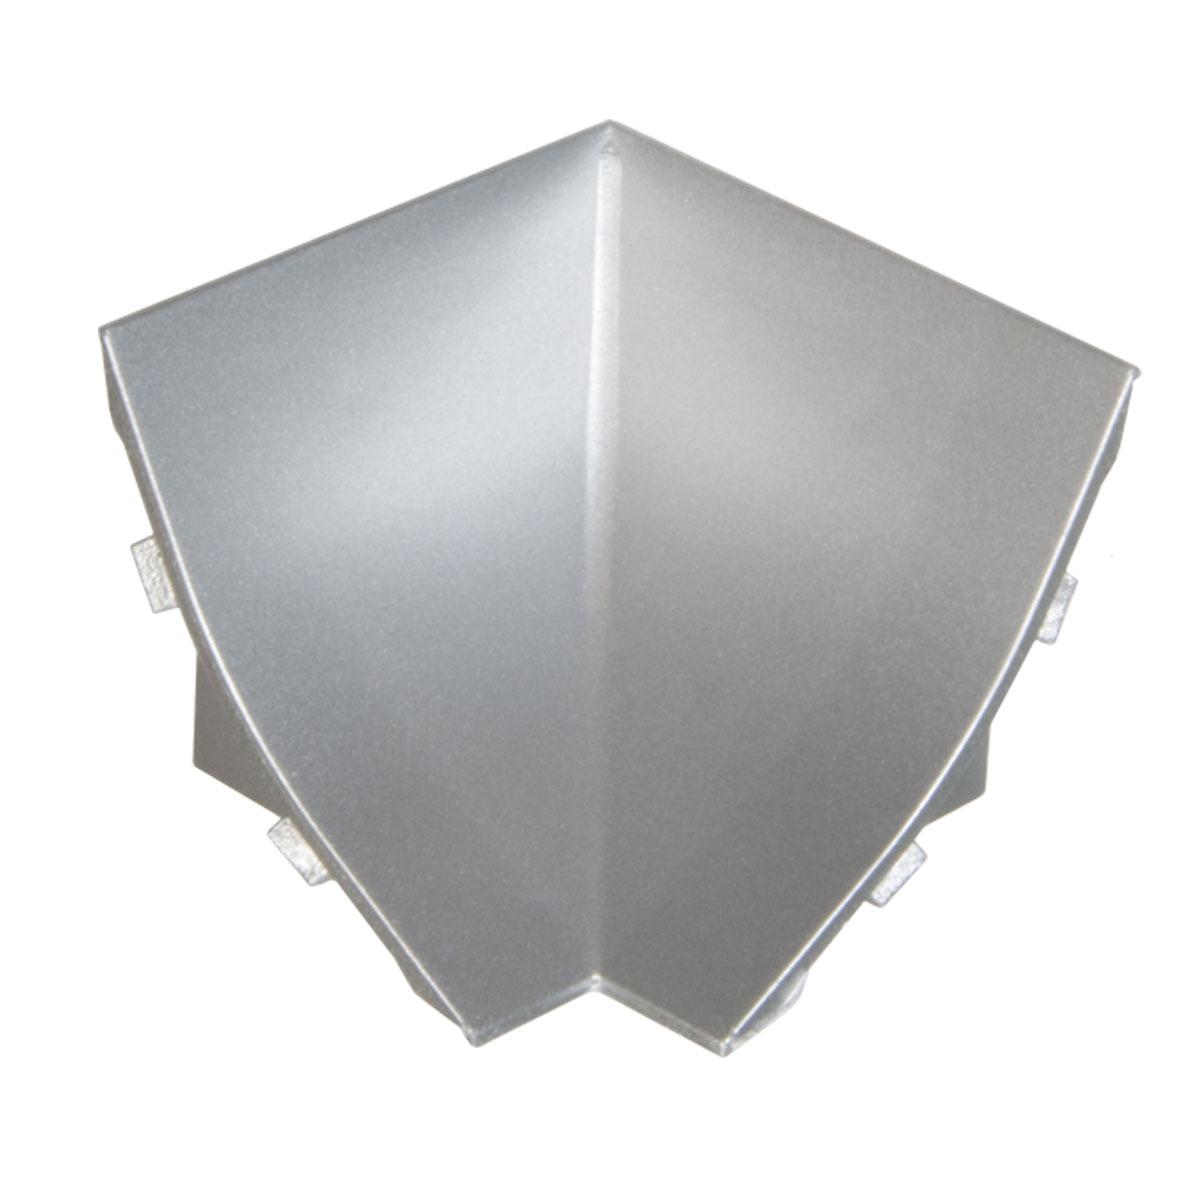 Fantastisch Dunkelbraun Küchenarbeitsplatte Ideen - Küchen Ideen ...